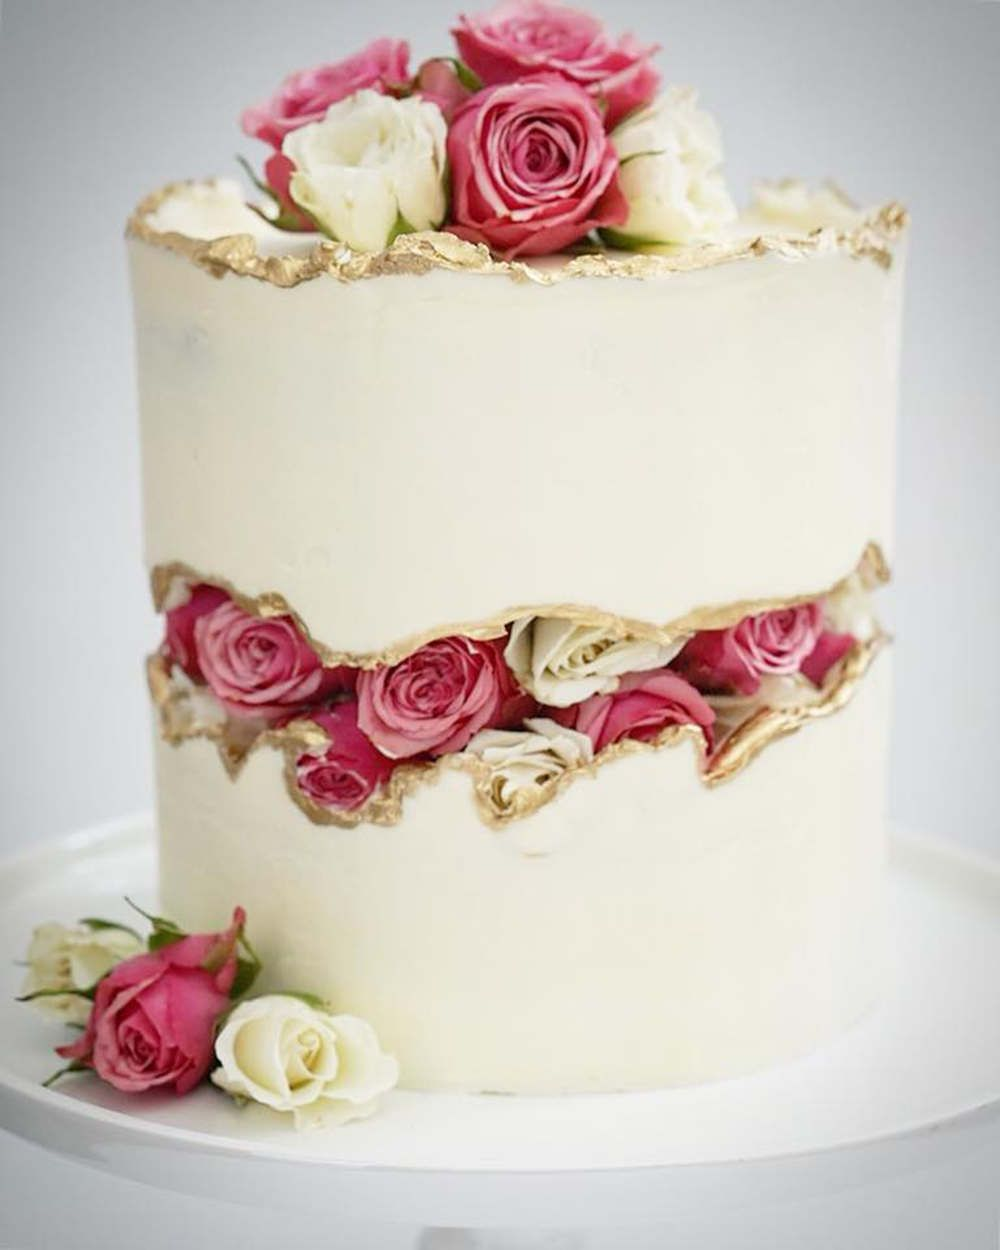 Strawberry Fault Line Cake Tutorial Video Sugar Geek Show Recipe Cake Tutorial Cake Cake Trends